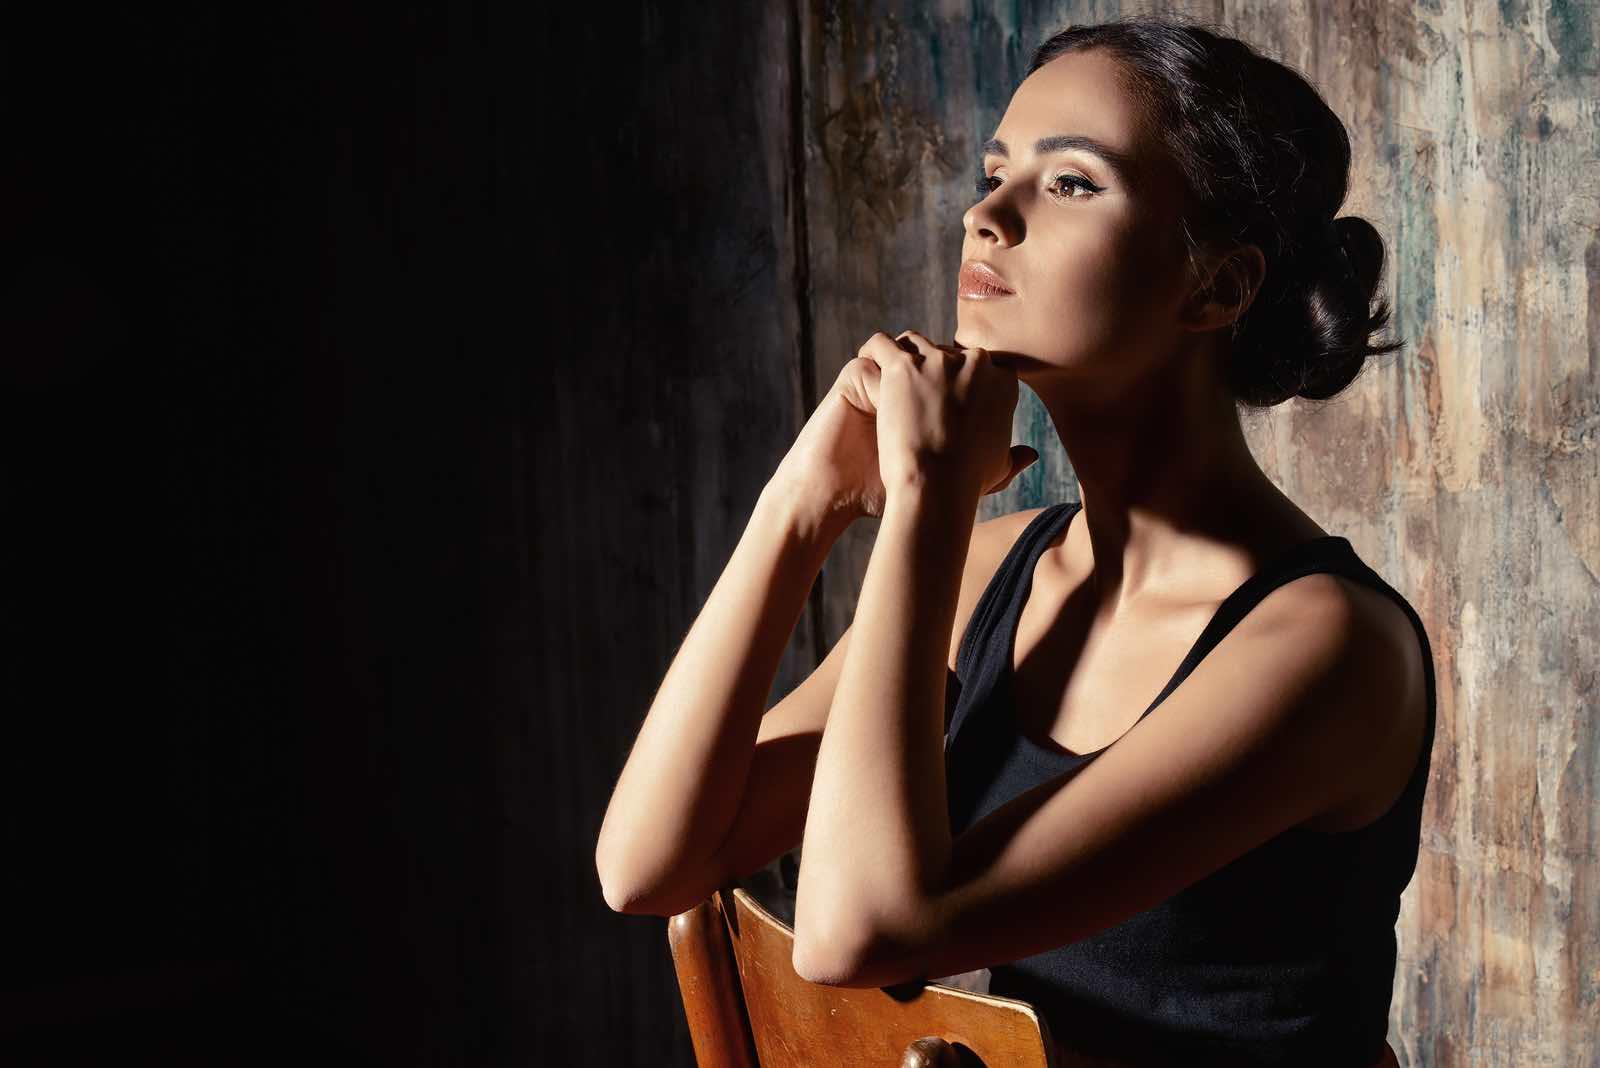 Close-up portrait of a beautiful elegant young woman. Art portrait.